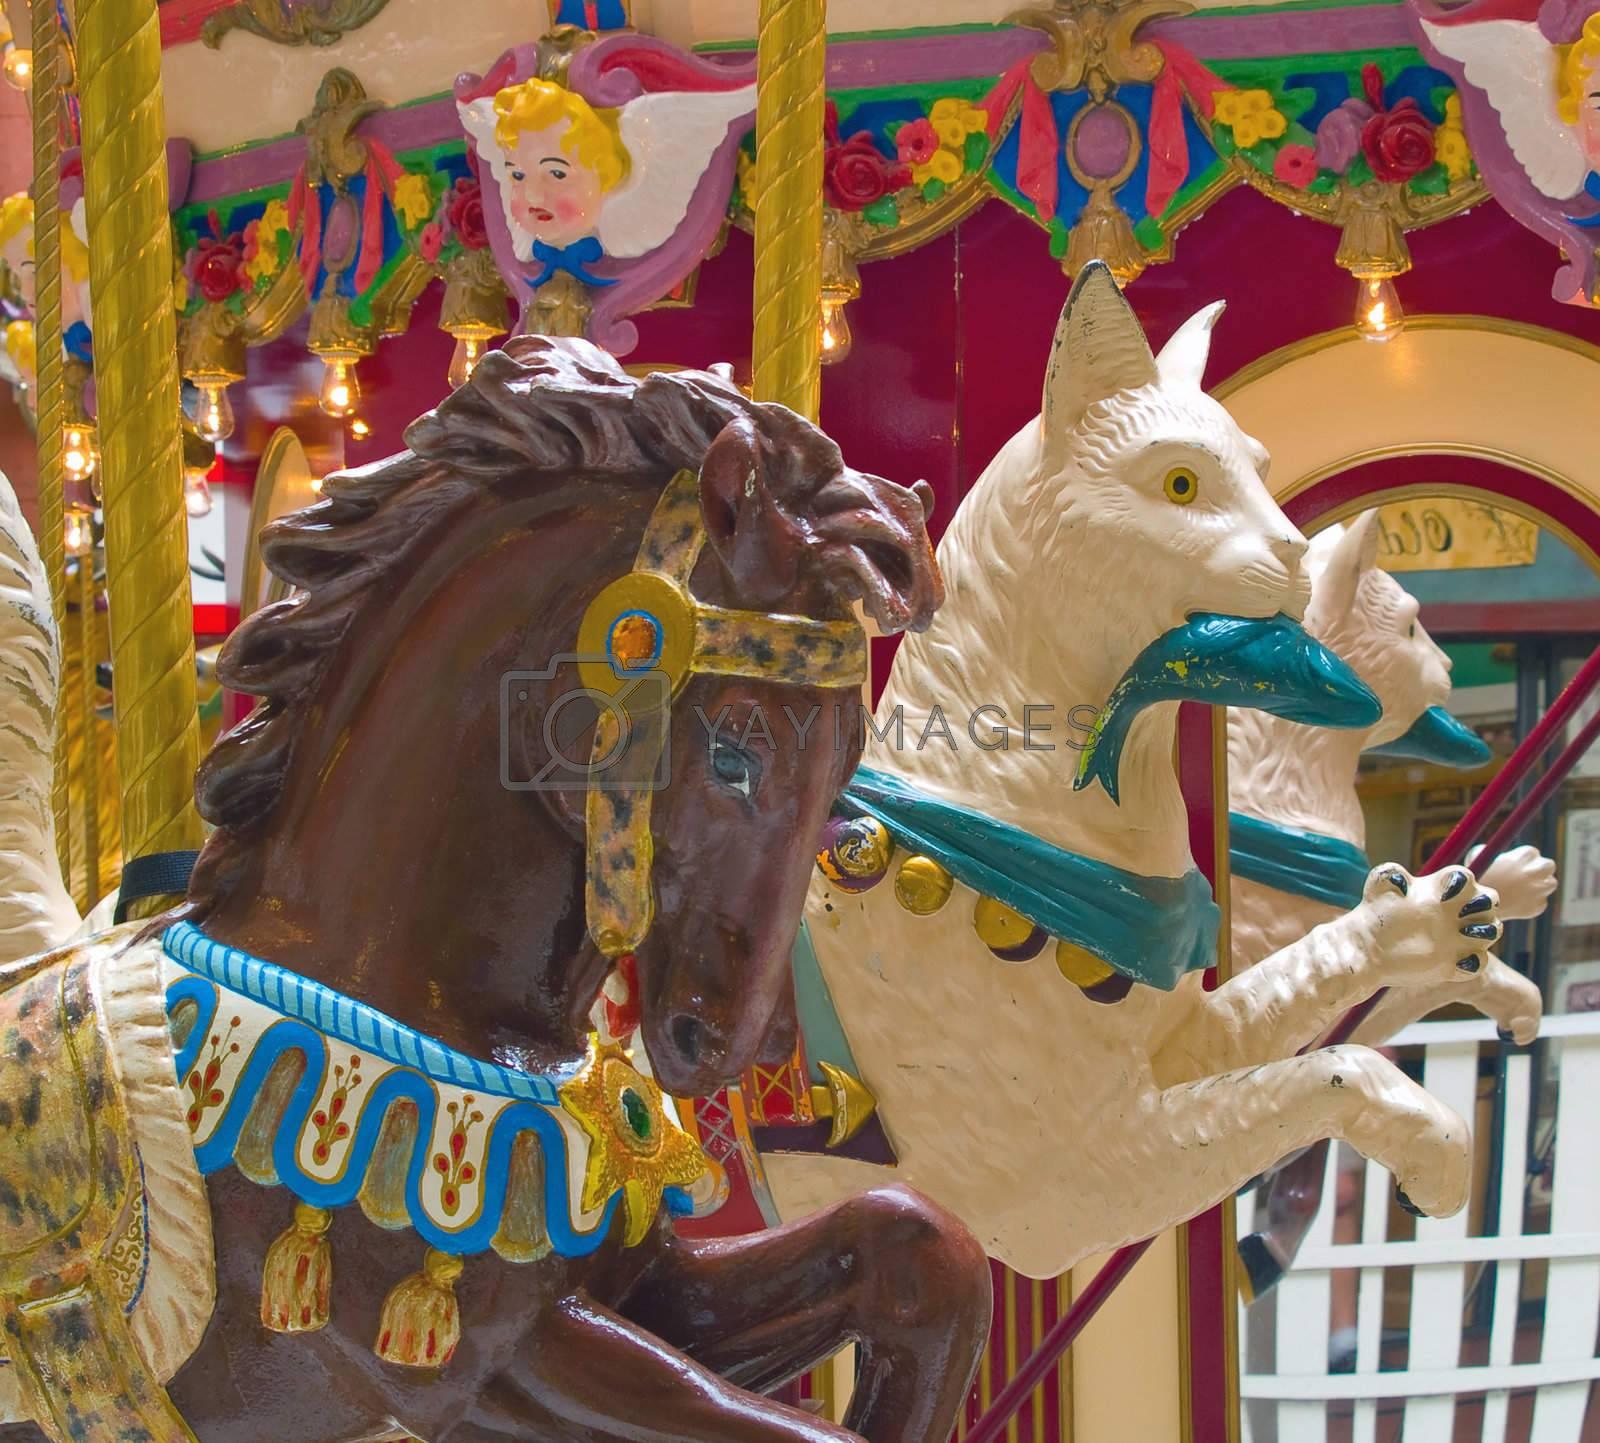 Carousel animals on an indoor amusement ride